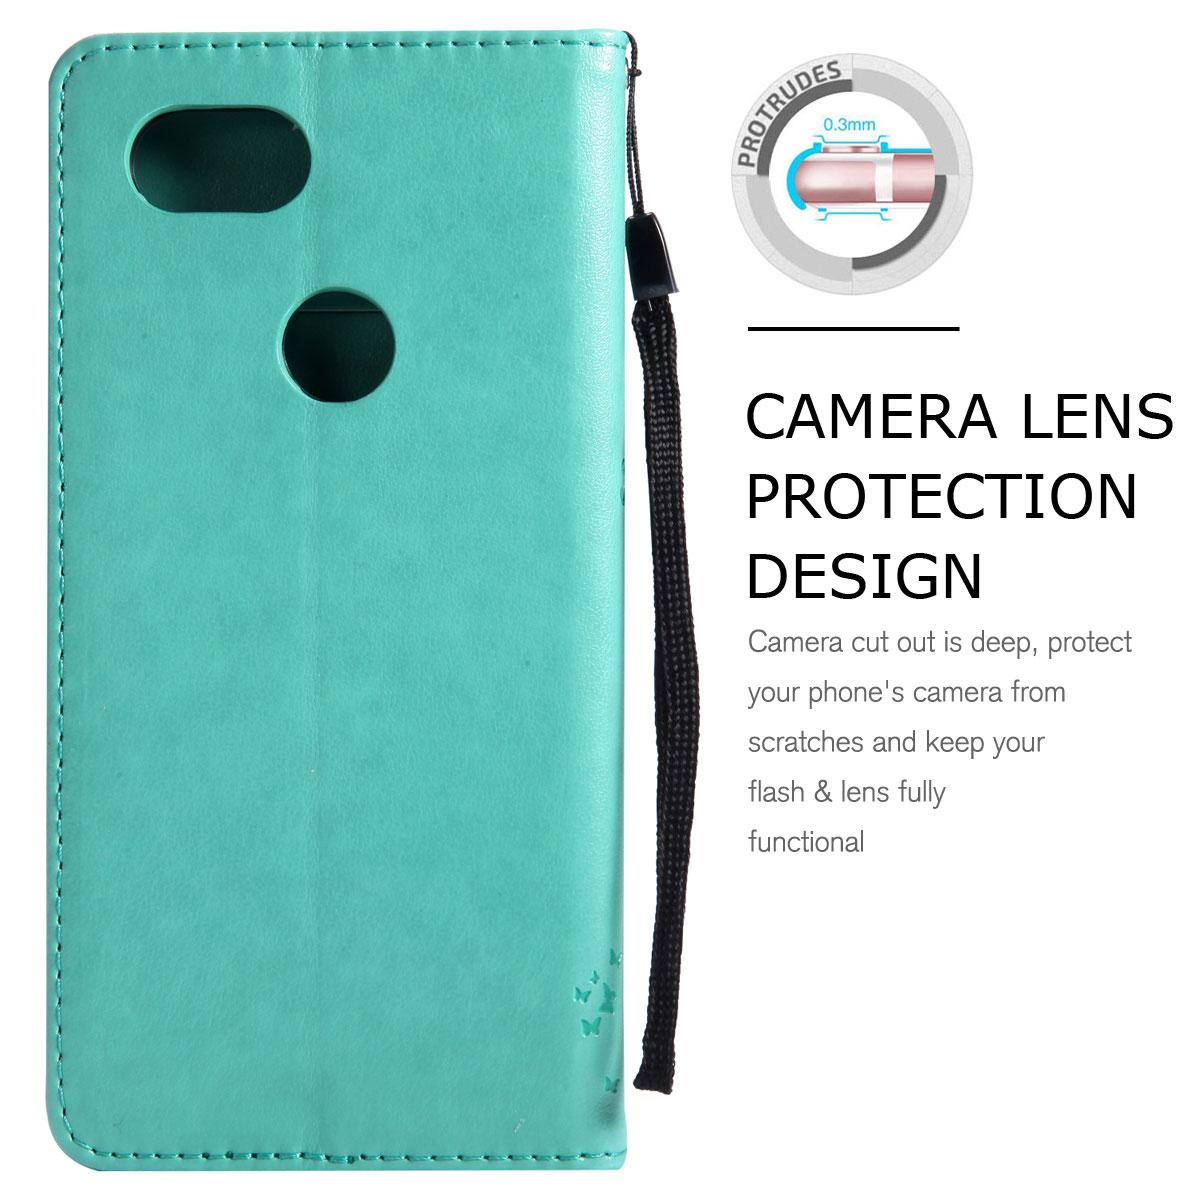 Magnetic-Leather-Credit-Card-Holder-Flip-Case-Cover-For-Google-Pixel-2-2-XL thumbnail 84